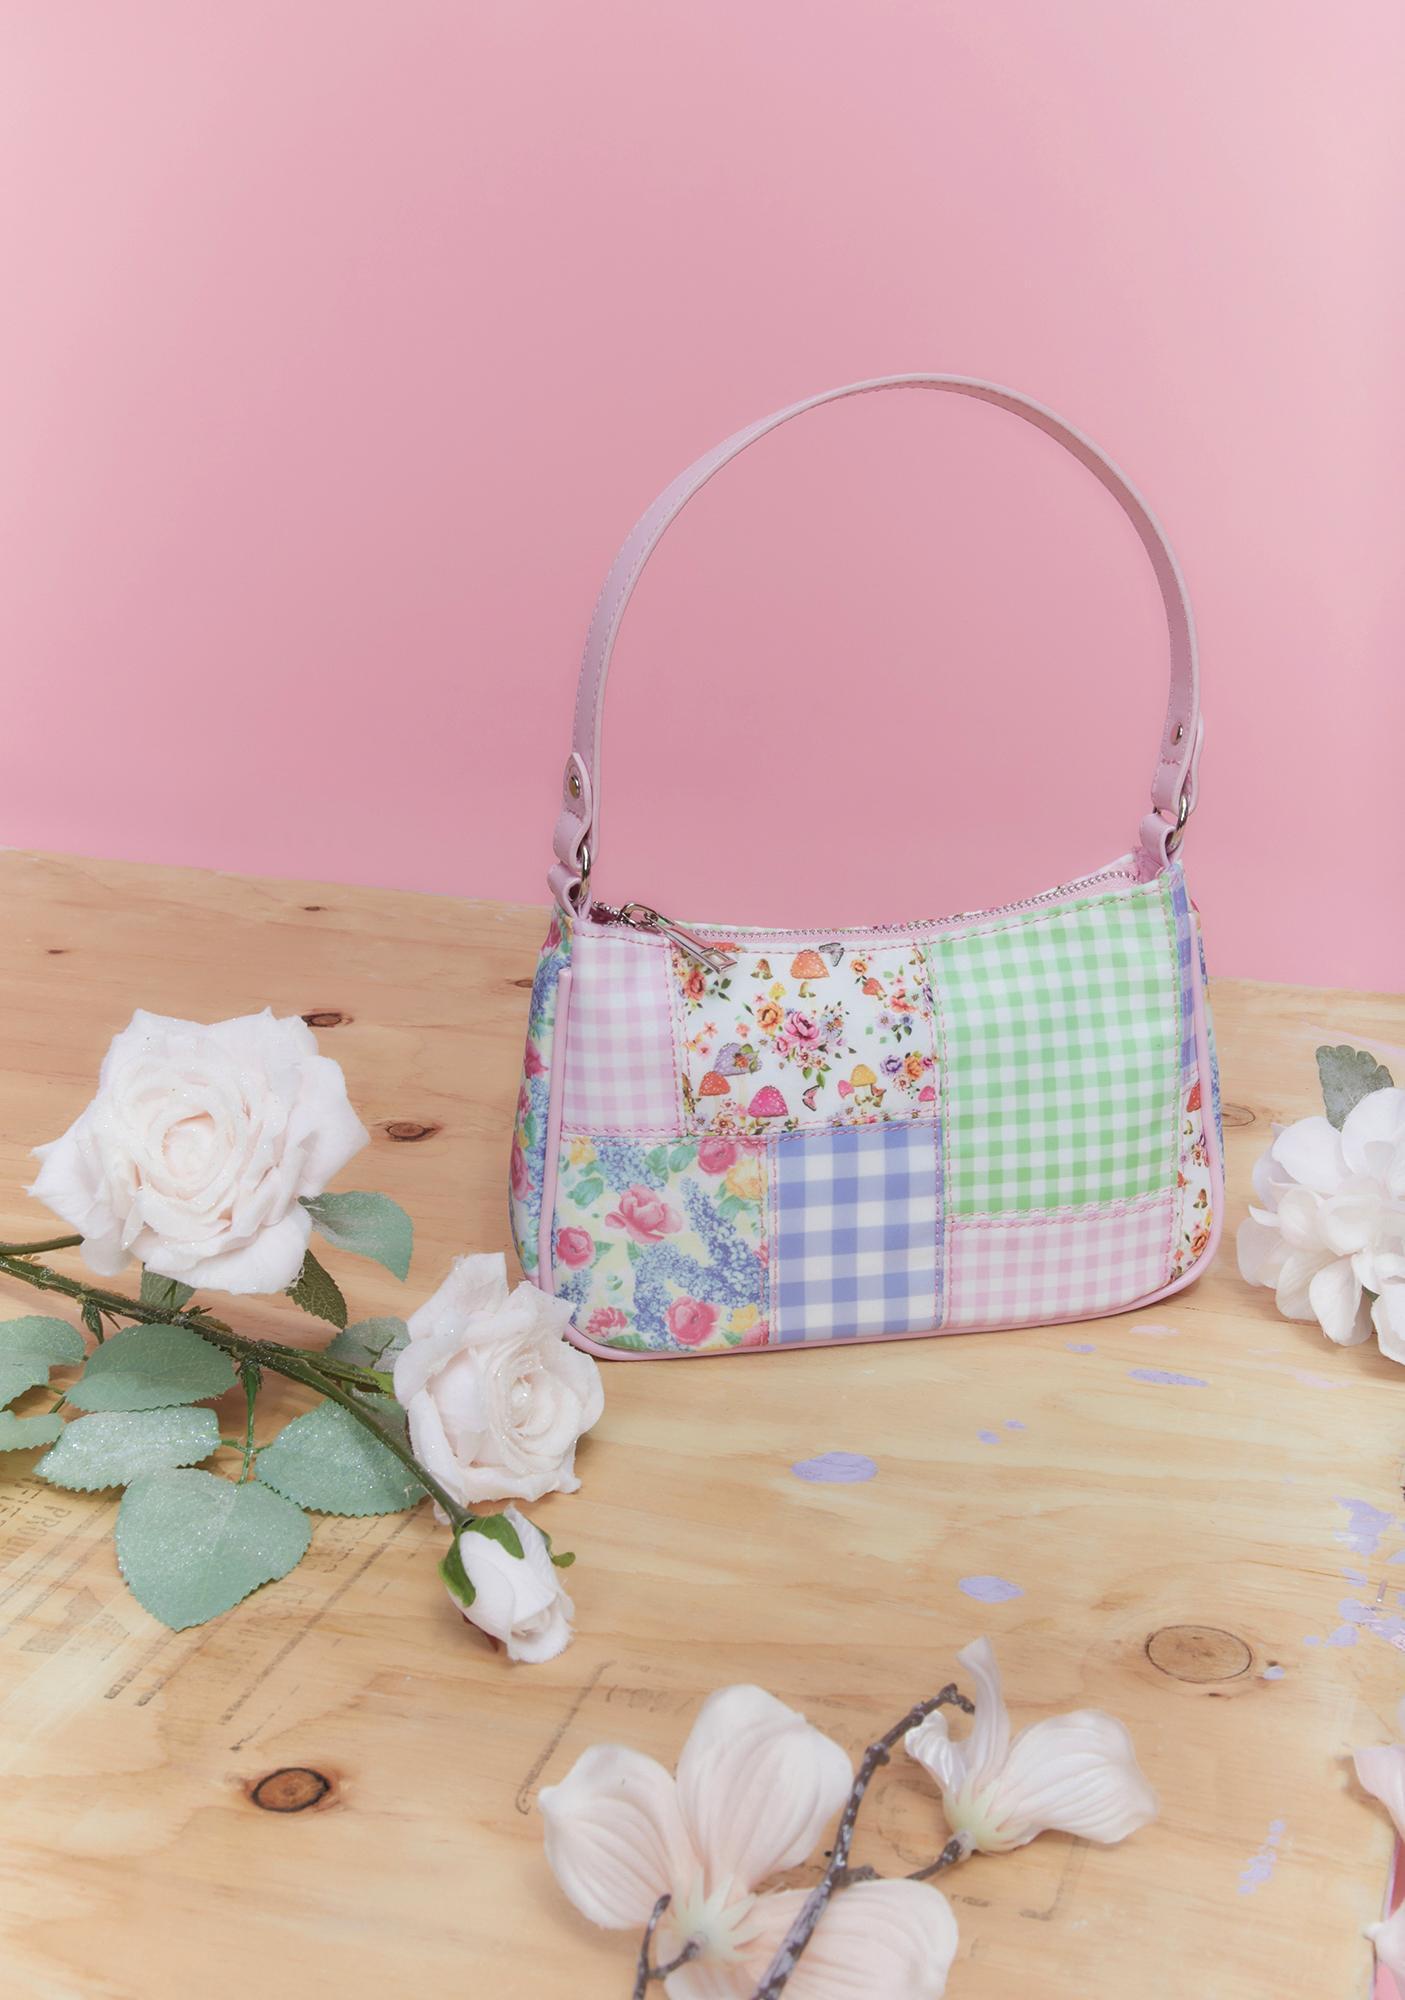 Sugar Thrillz Planting Dreams Patchwork Baguette Bag